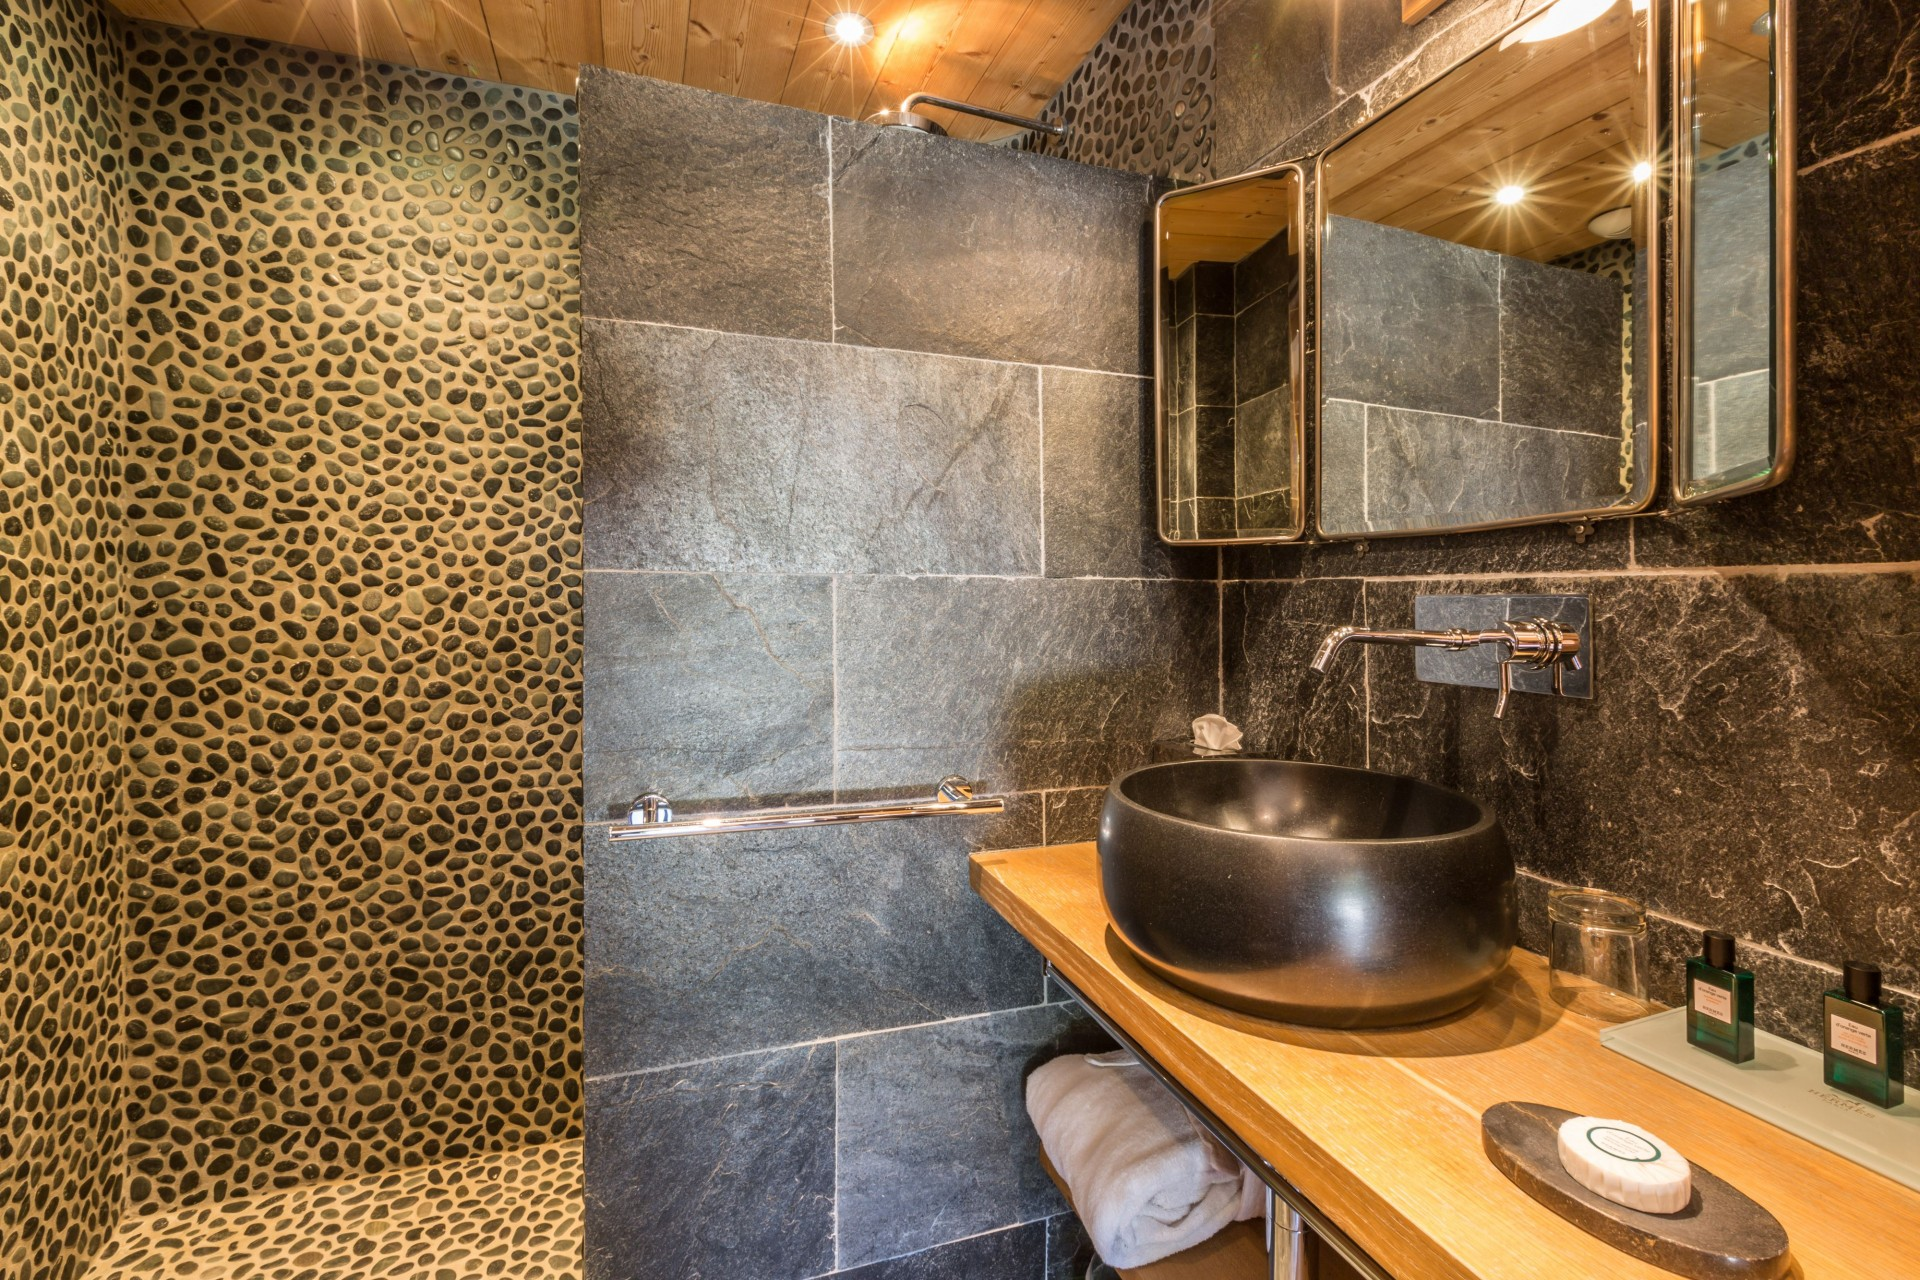 Argentière Location Chalet Luxe Calderite Chambre1 Sdb